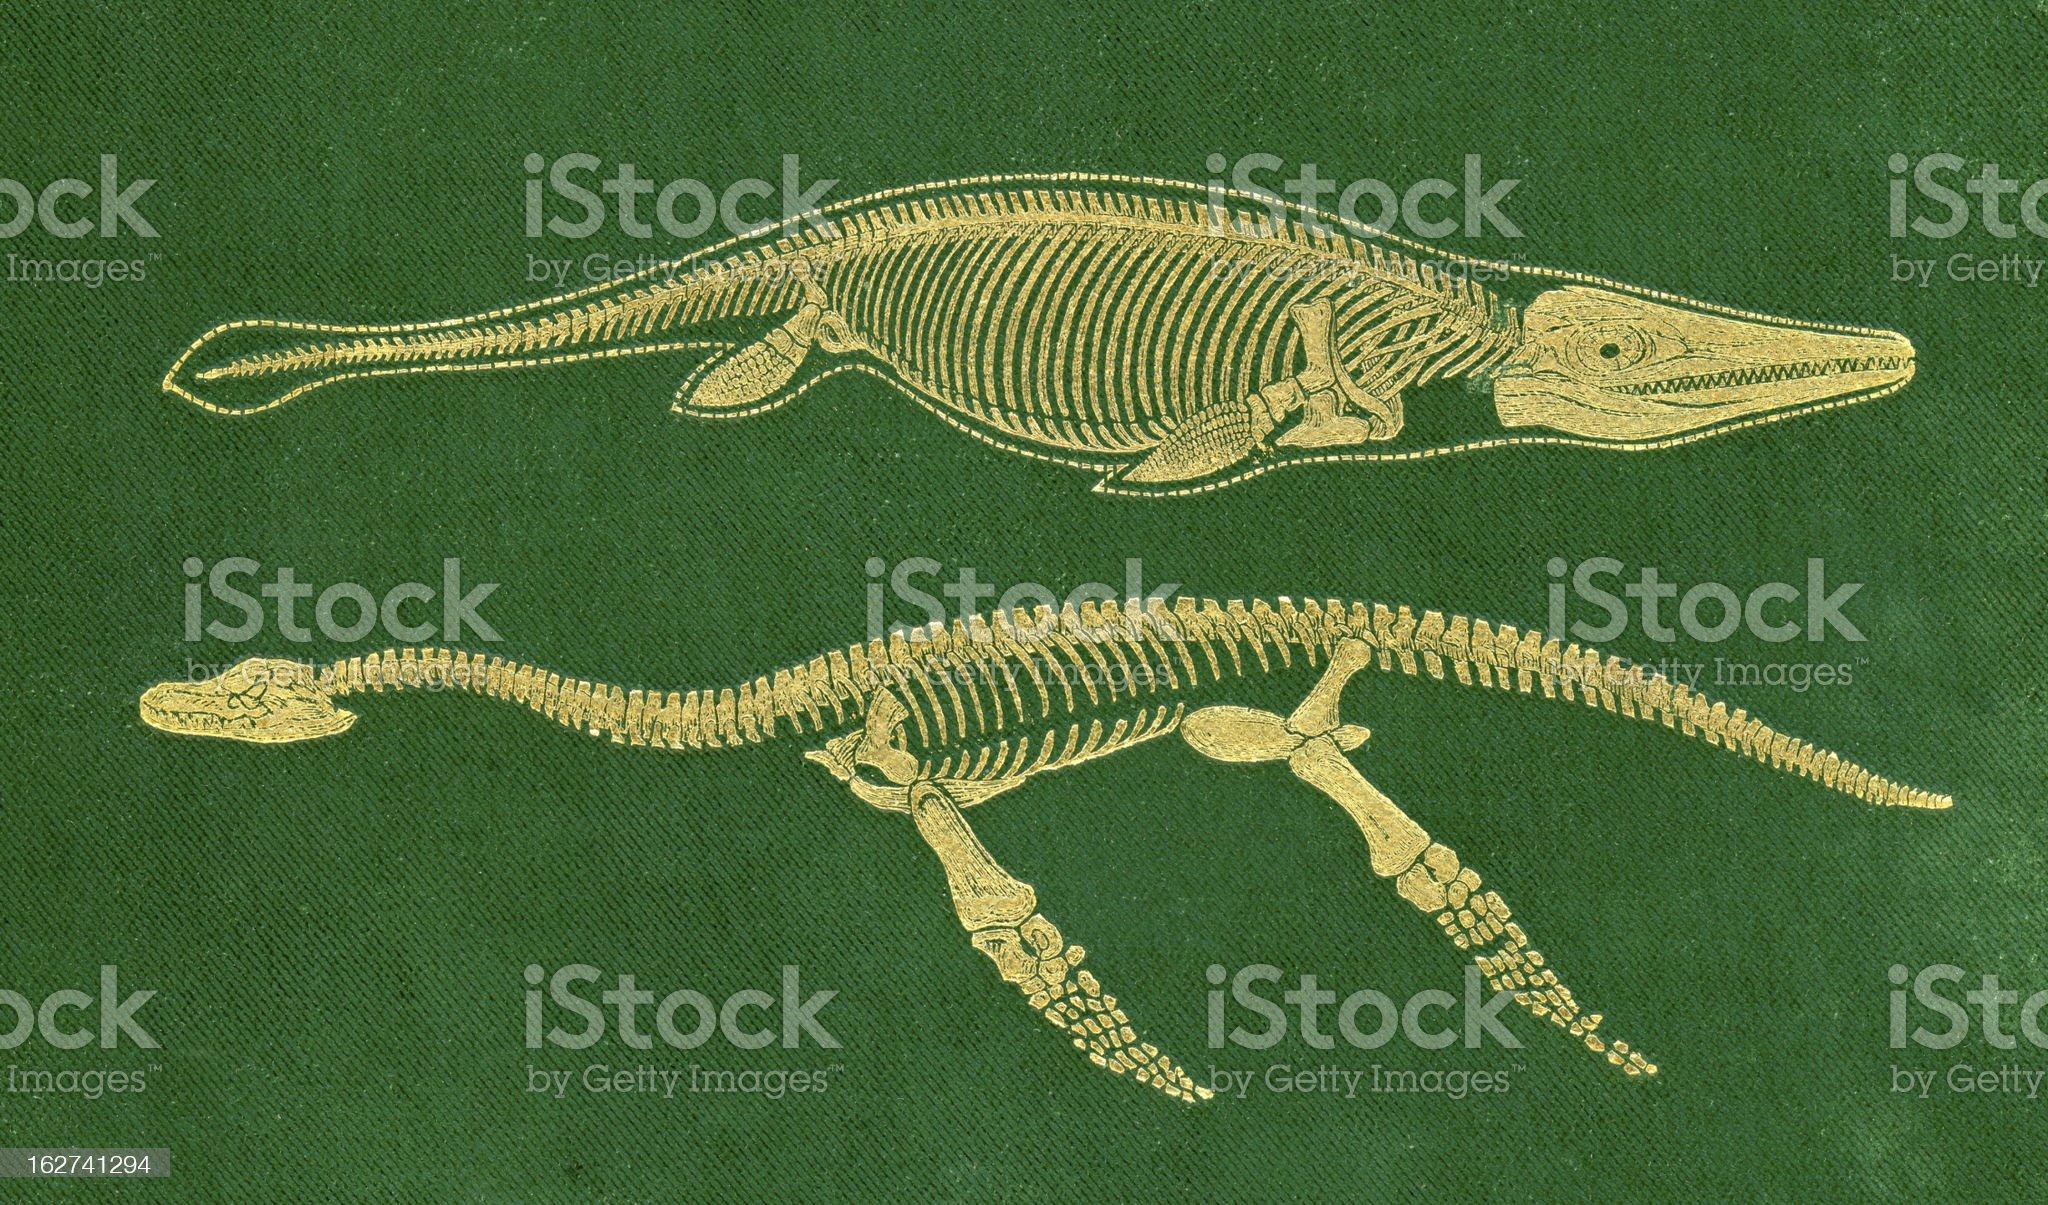 Dinosaur - Ichthyosaurus and Plesiosaurus royalty-free stock vector art